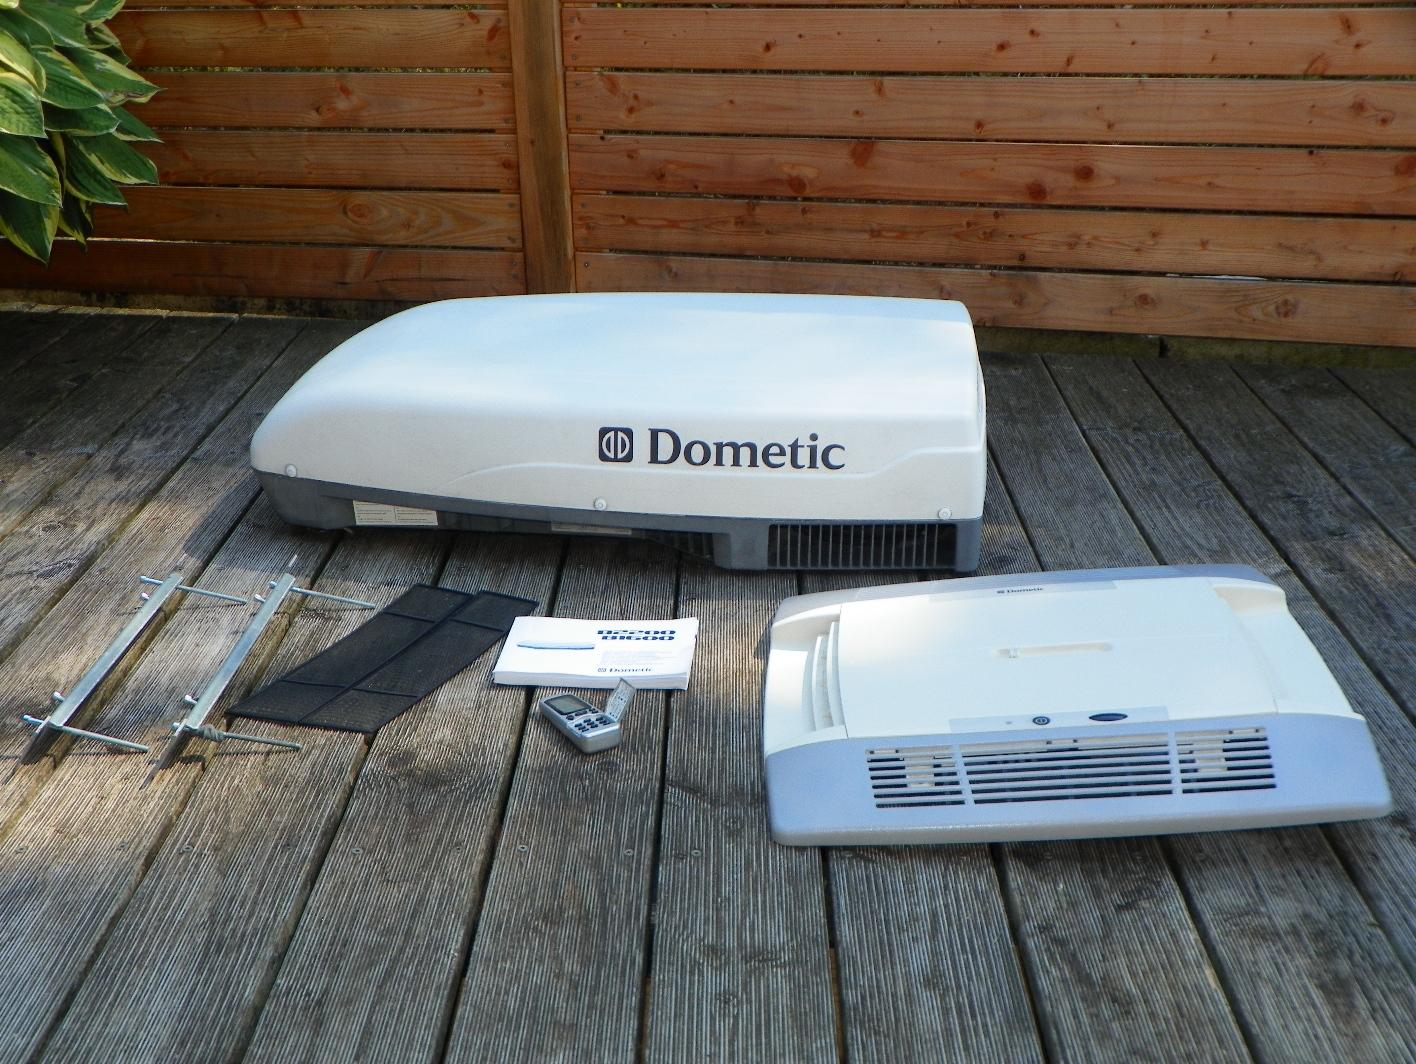 dometic b2200 klimaanlage dachklimaanlage f r wohnmobile. Black Bedroom Furniture Sets. Home Design Ideas